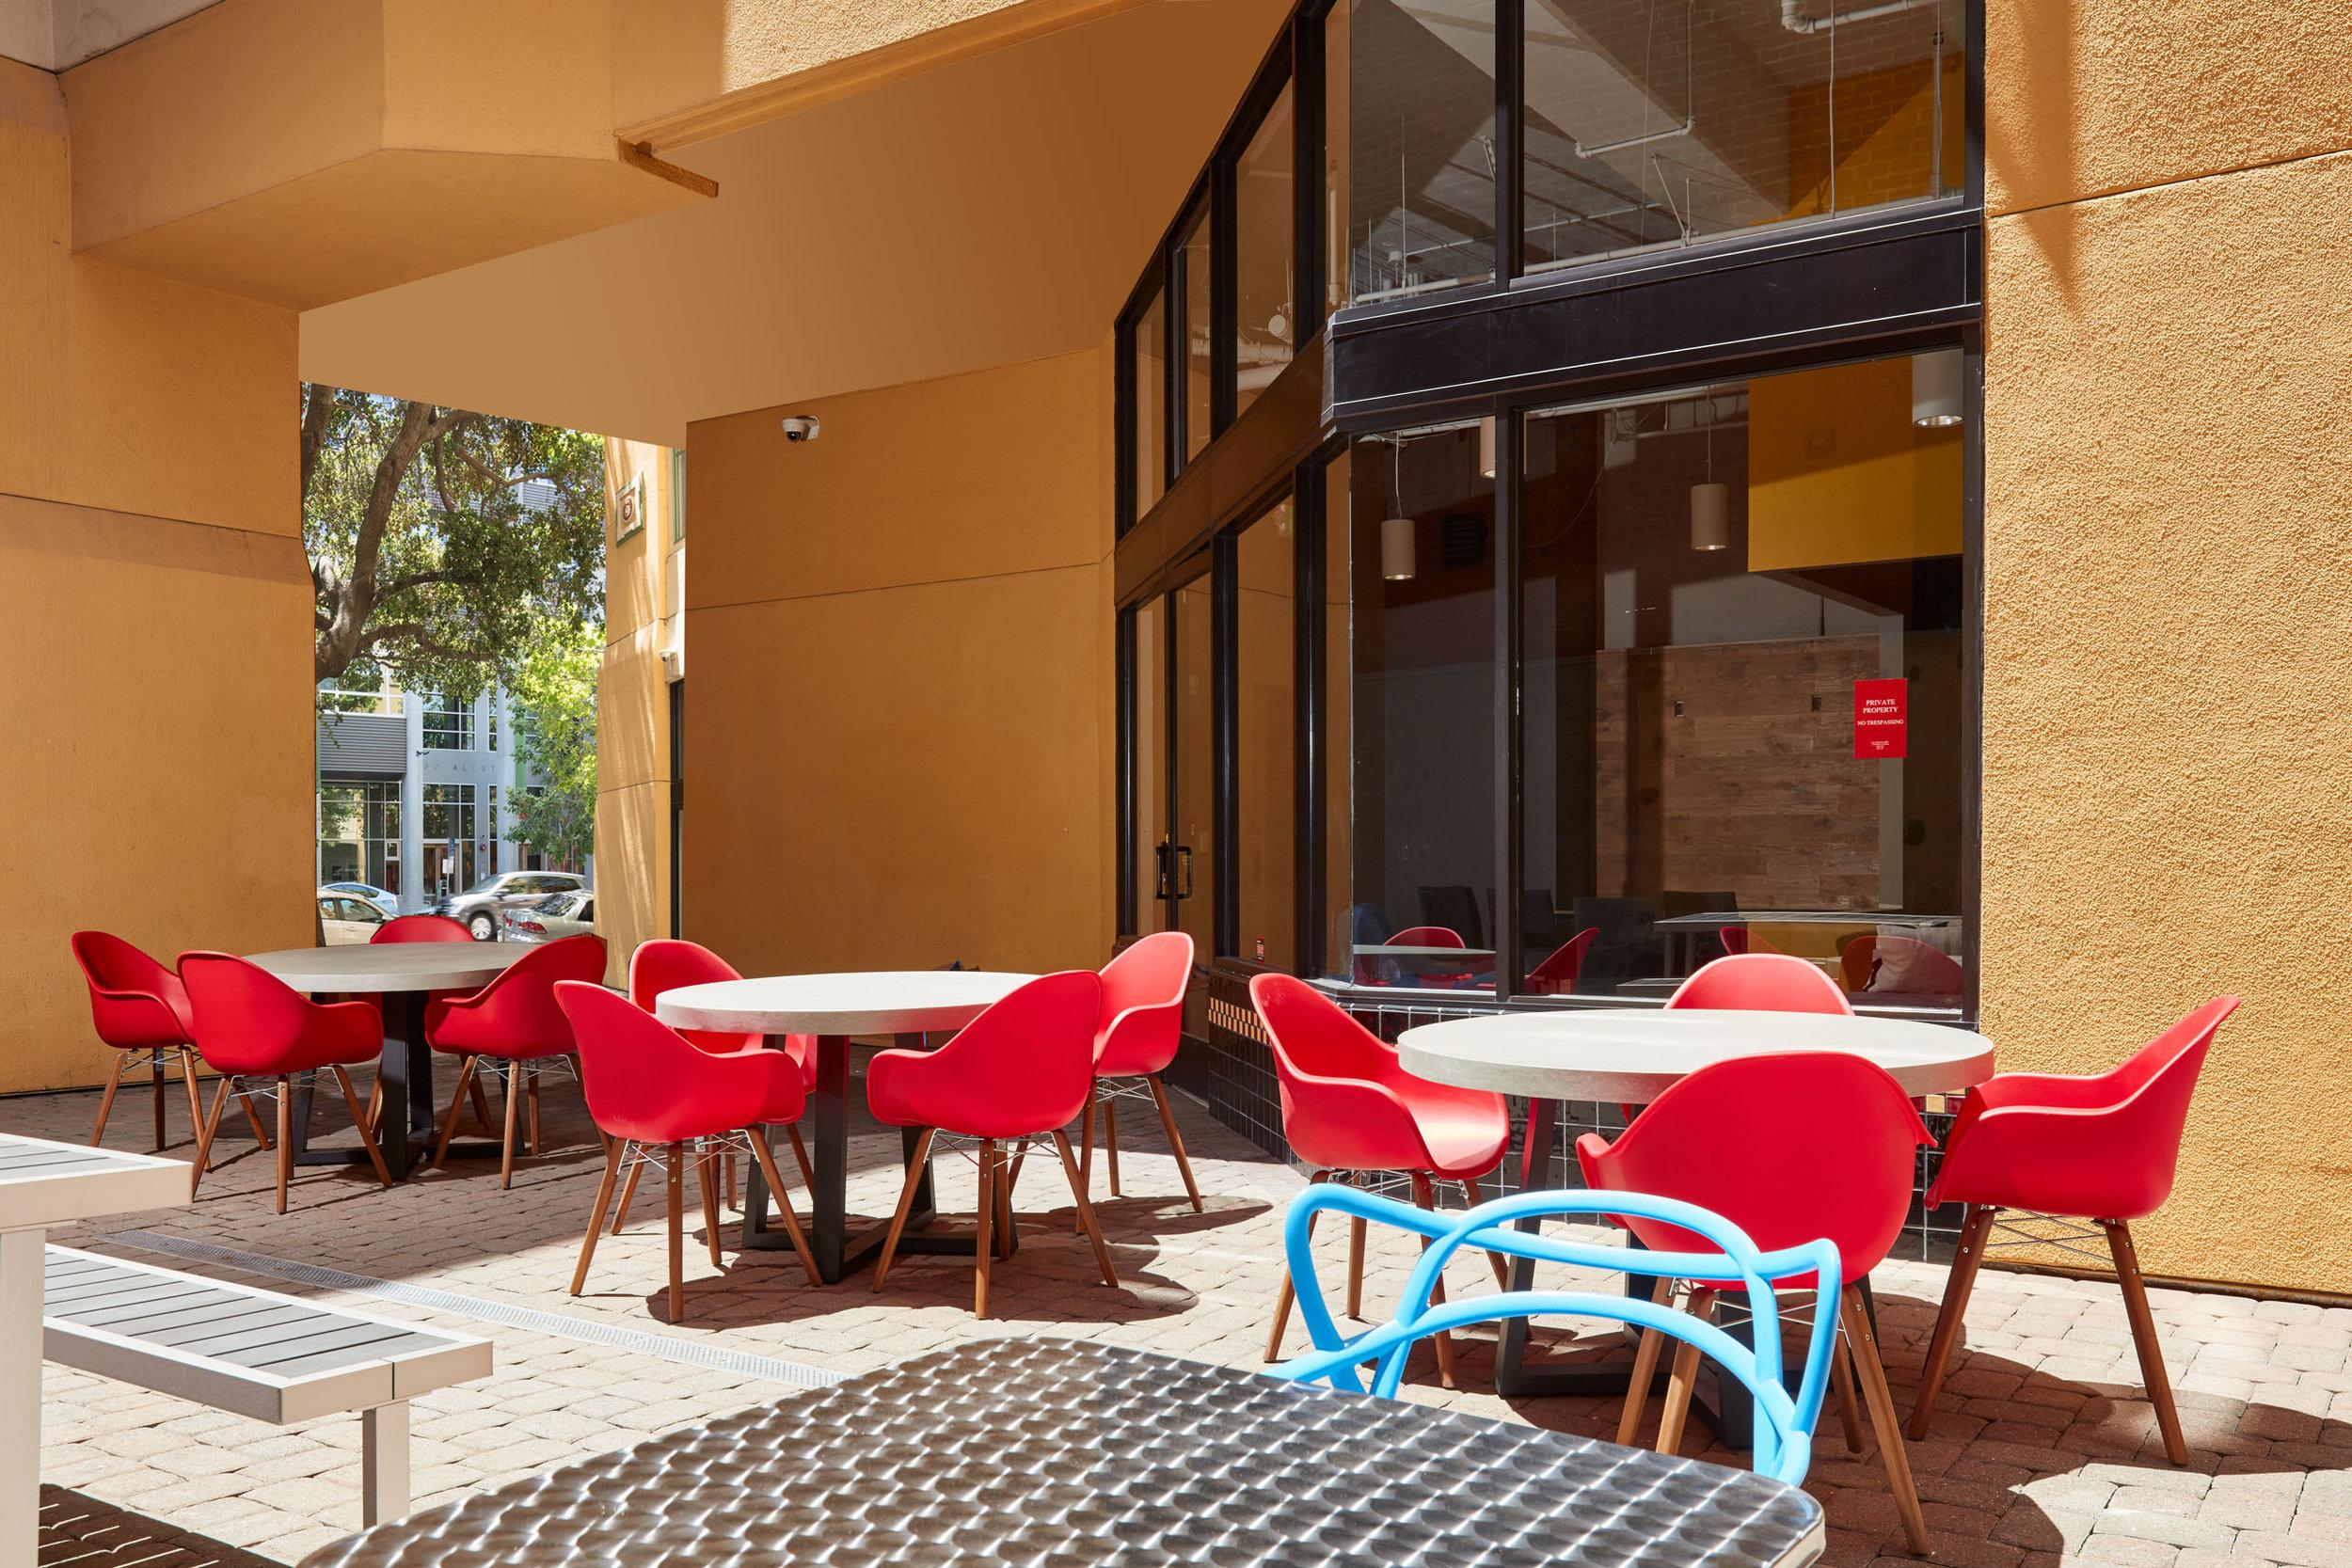 Allston - Courtyard